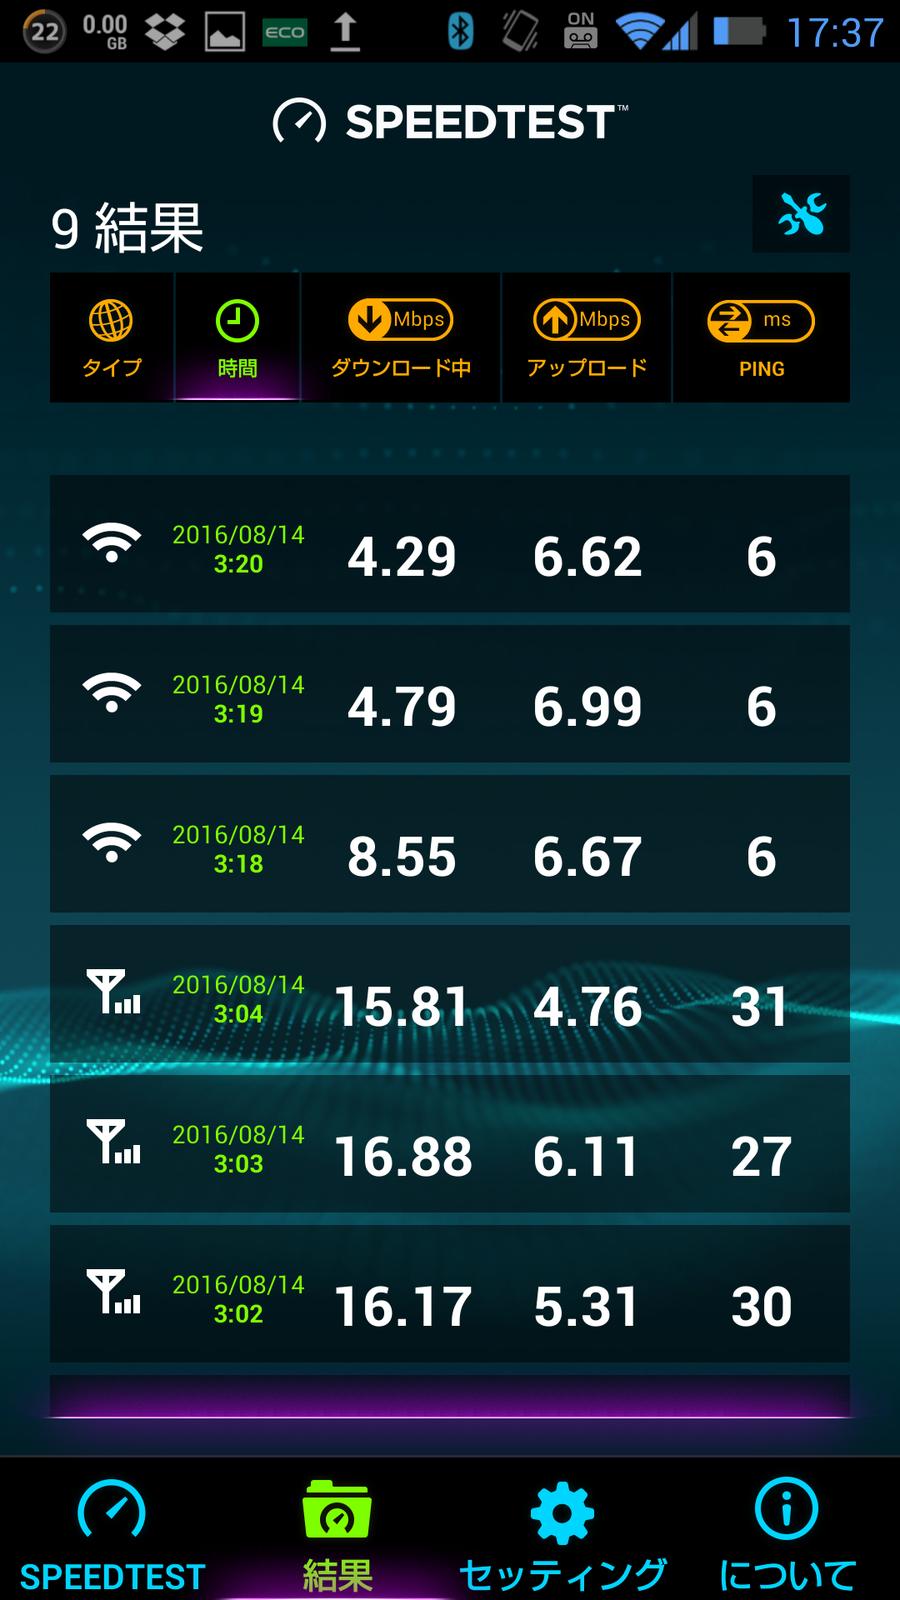 0_sim_speedtestnet_1